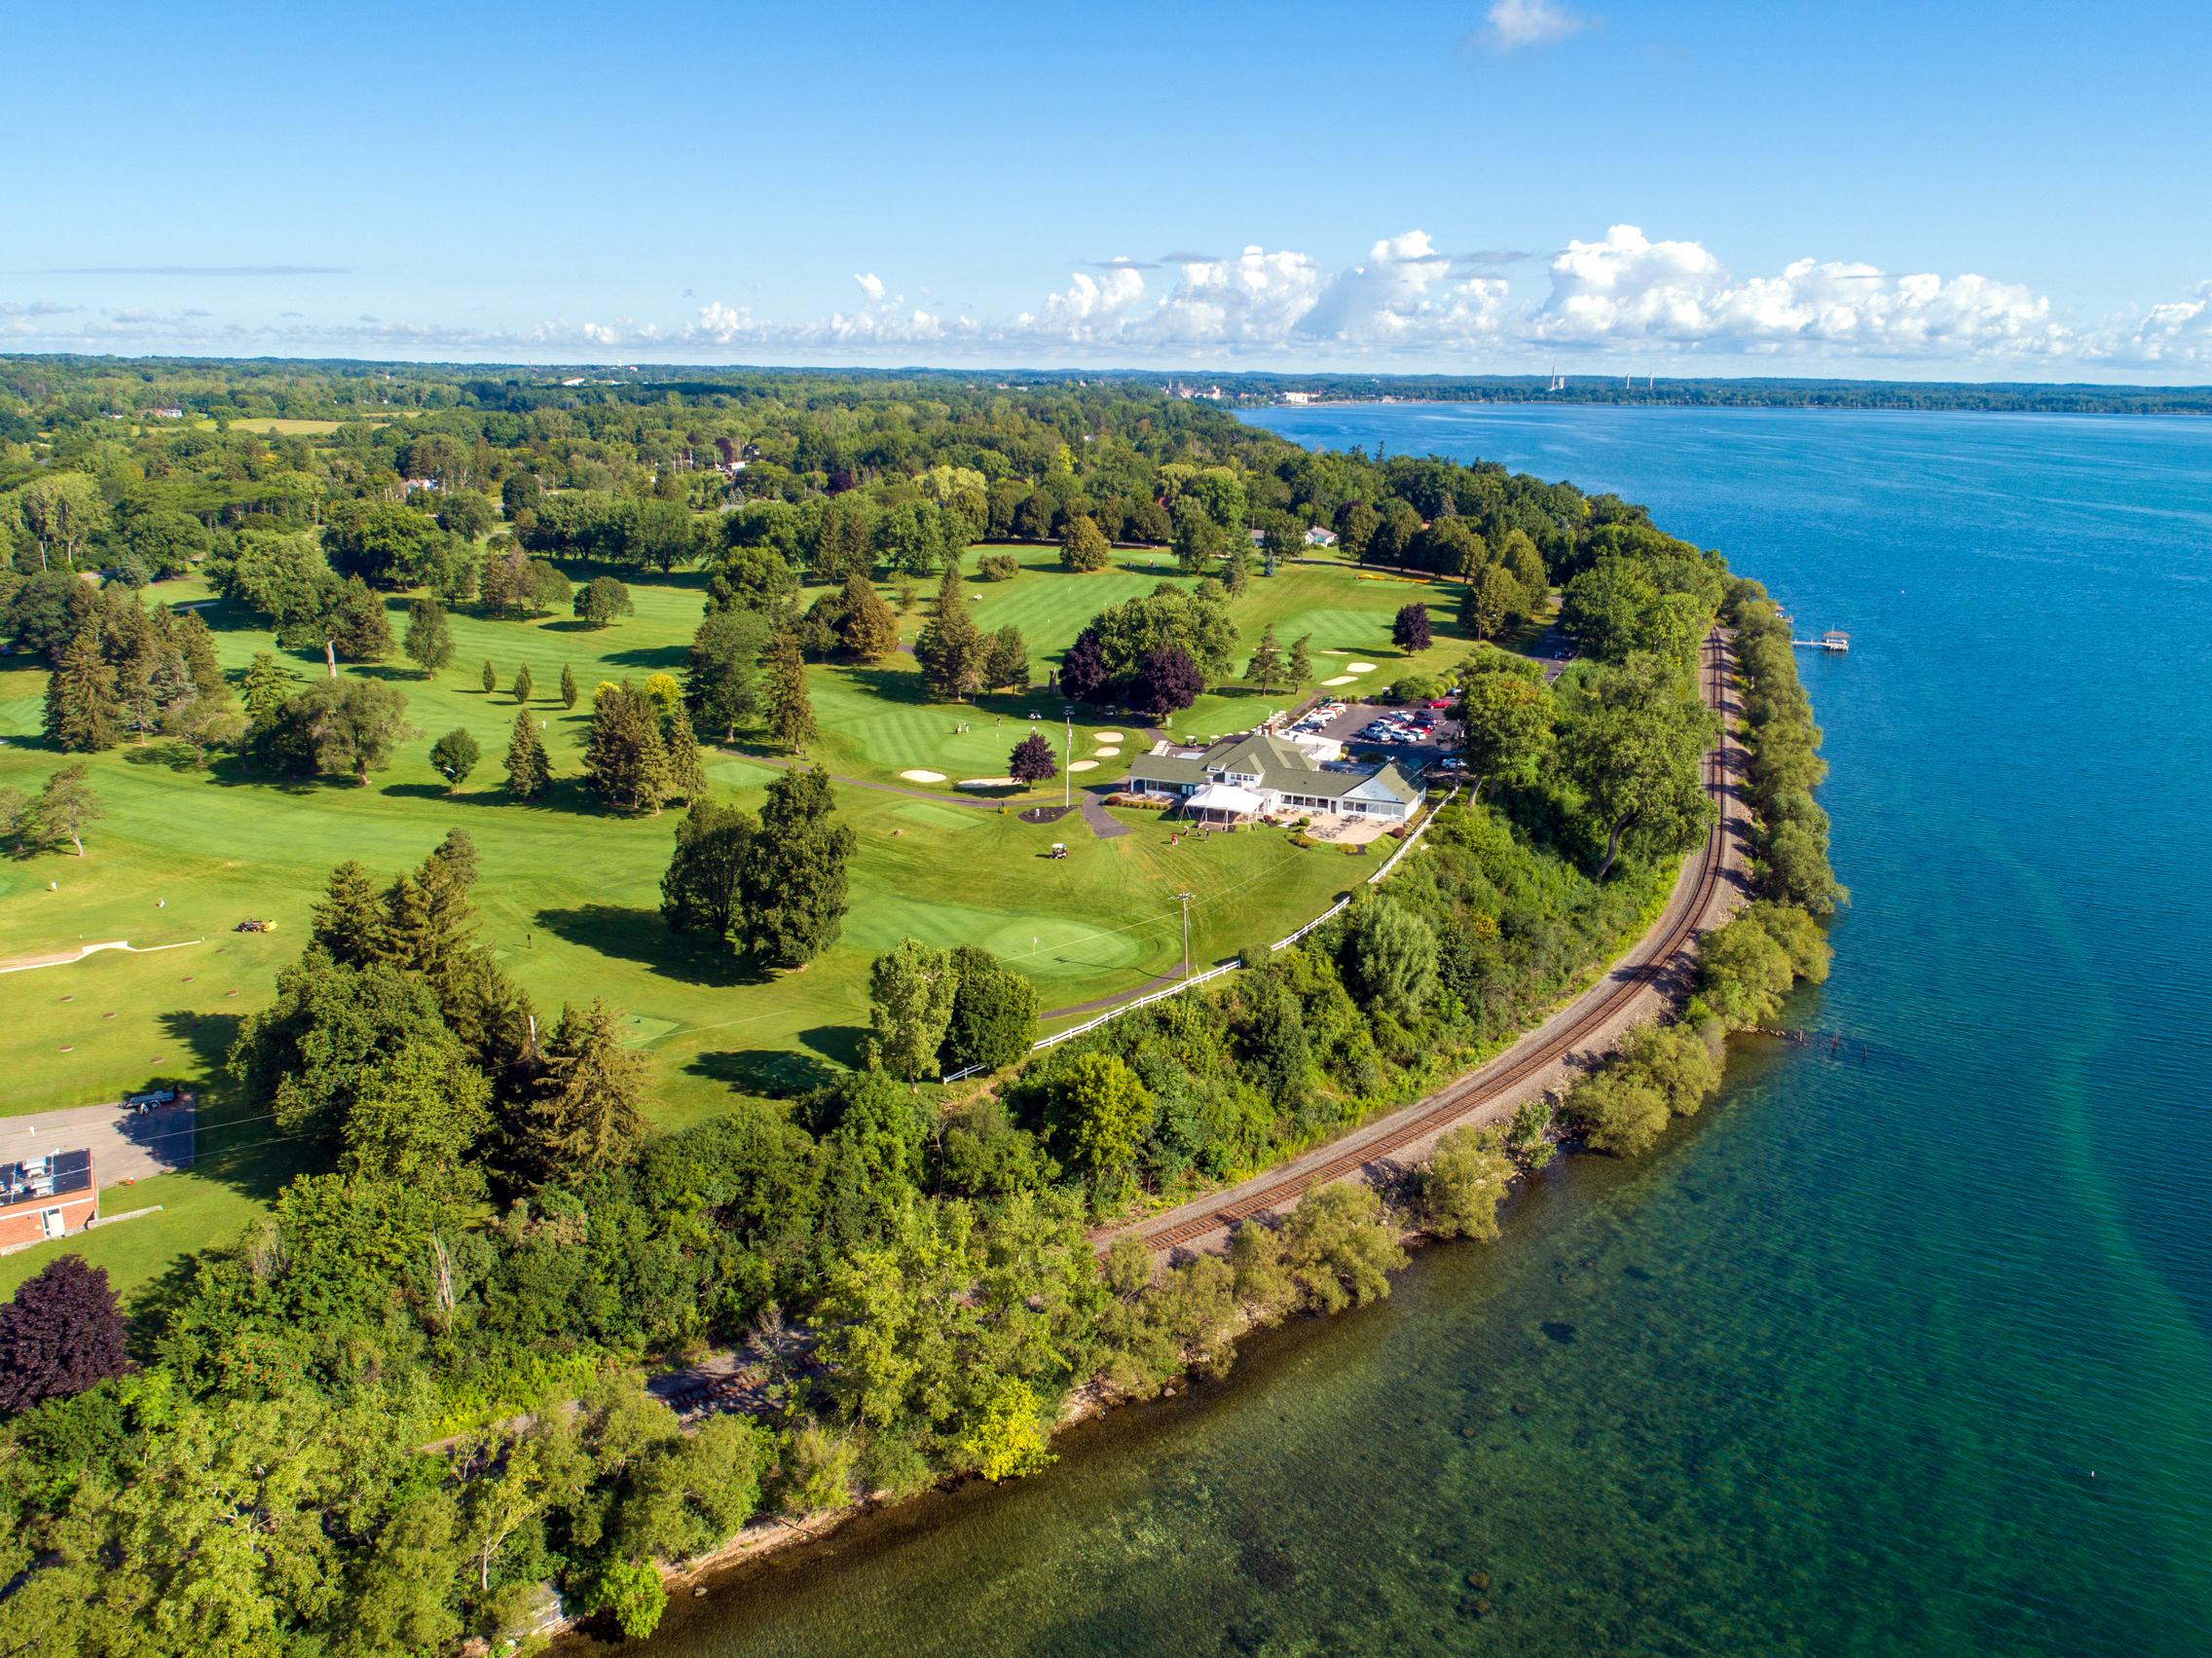 Geneva Country Club Golf Course on Seneca Lake